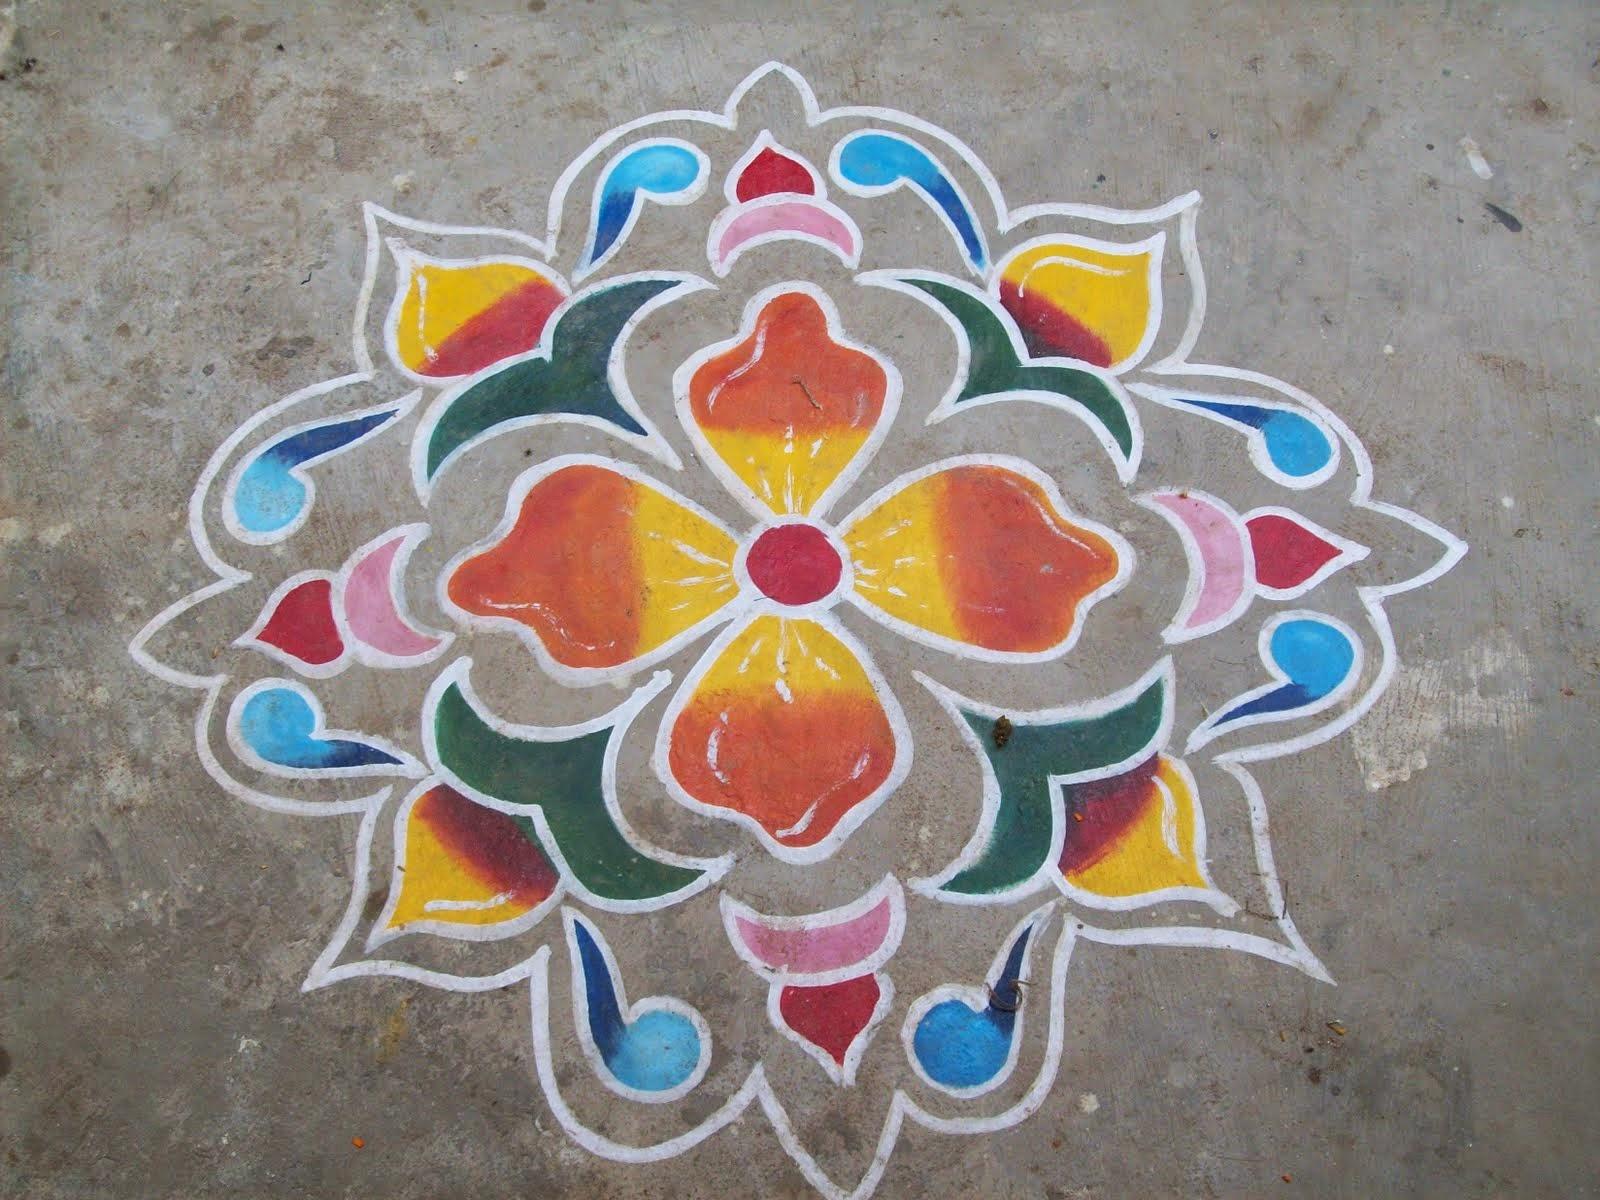 Diwali Kolam Designs   Diwali Rangoli Designs 2014  Diwali Rangoli Images Designs Diwali Rangoli